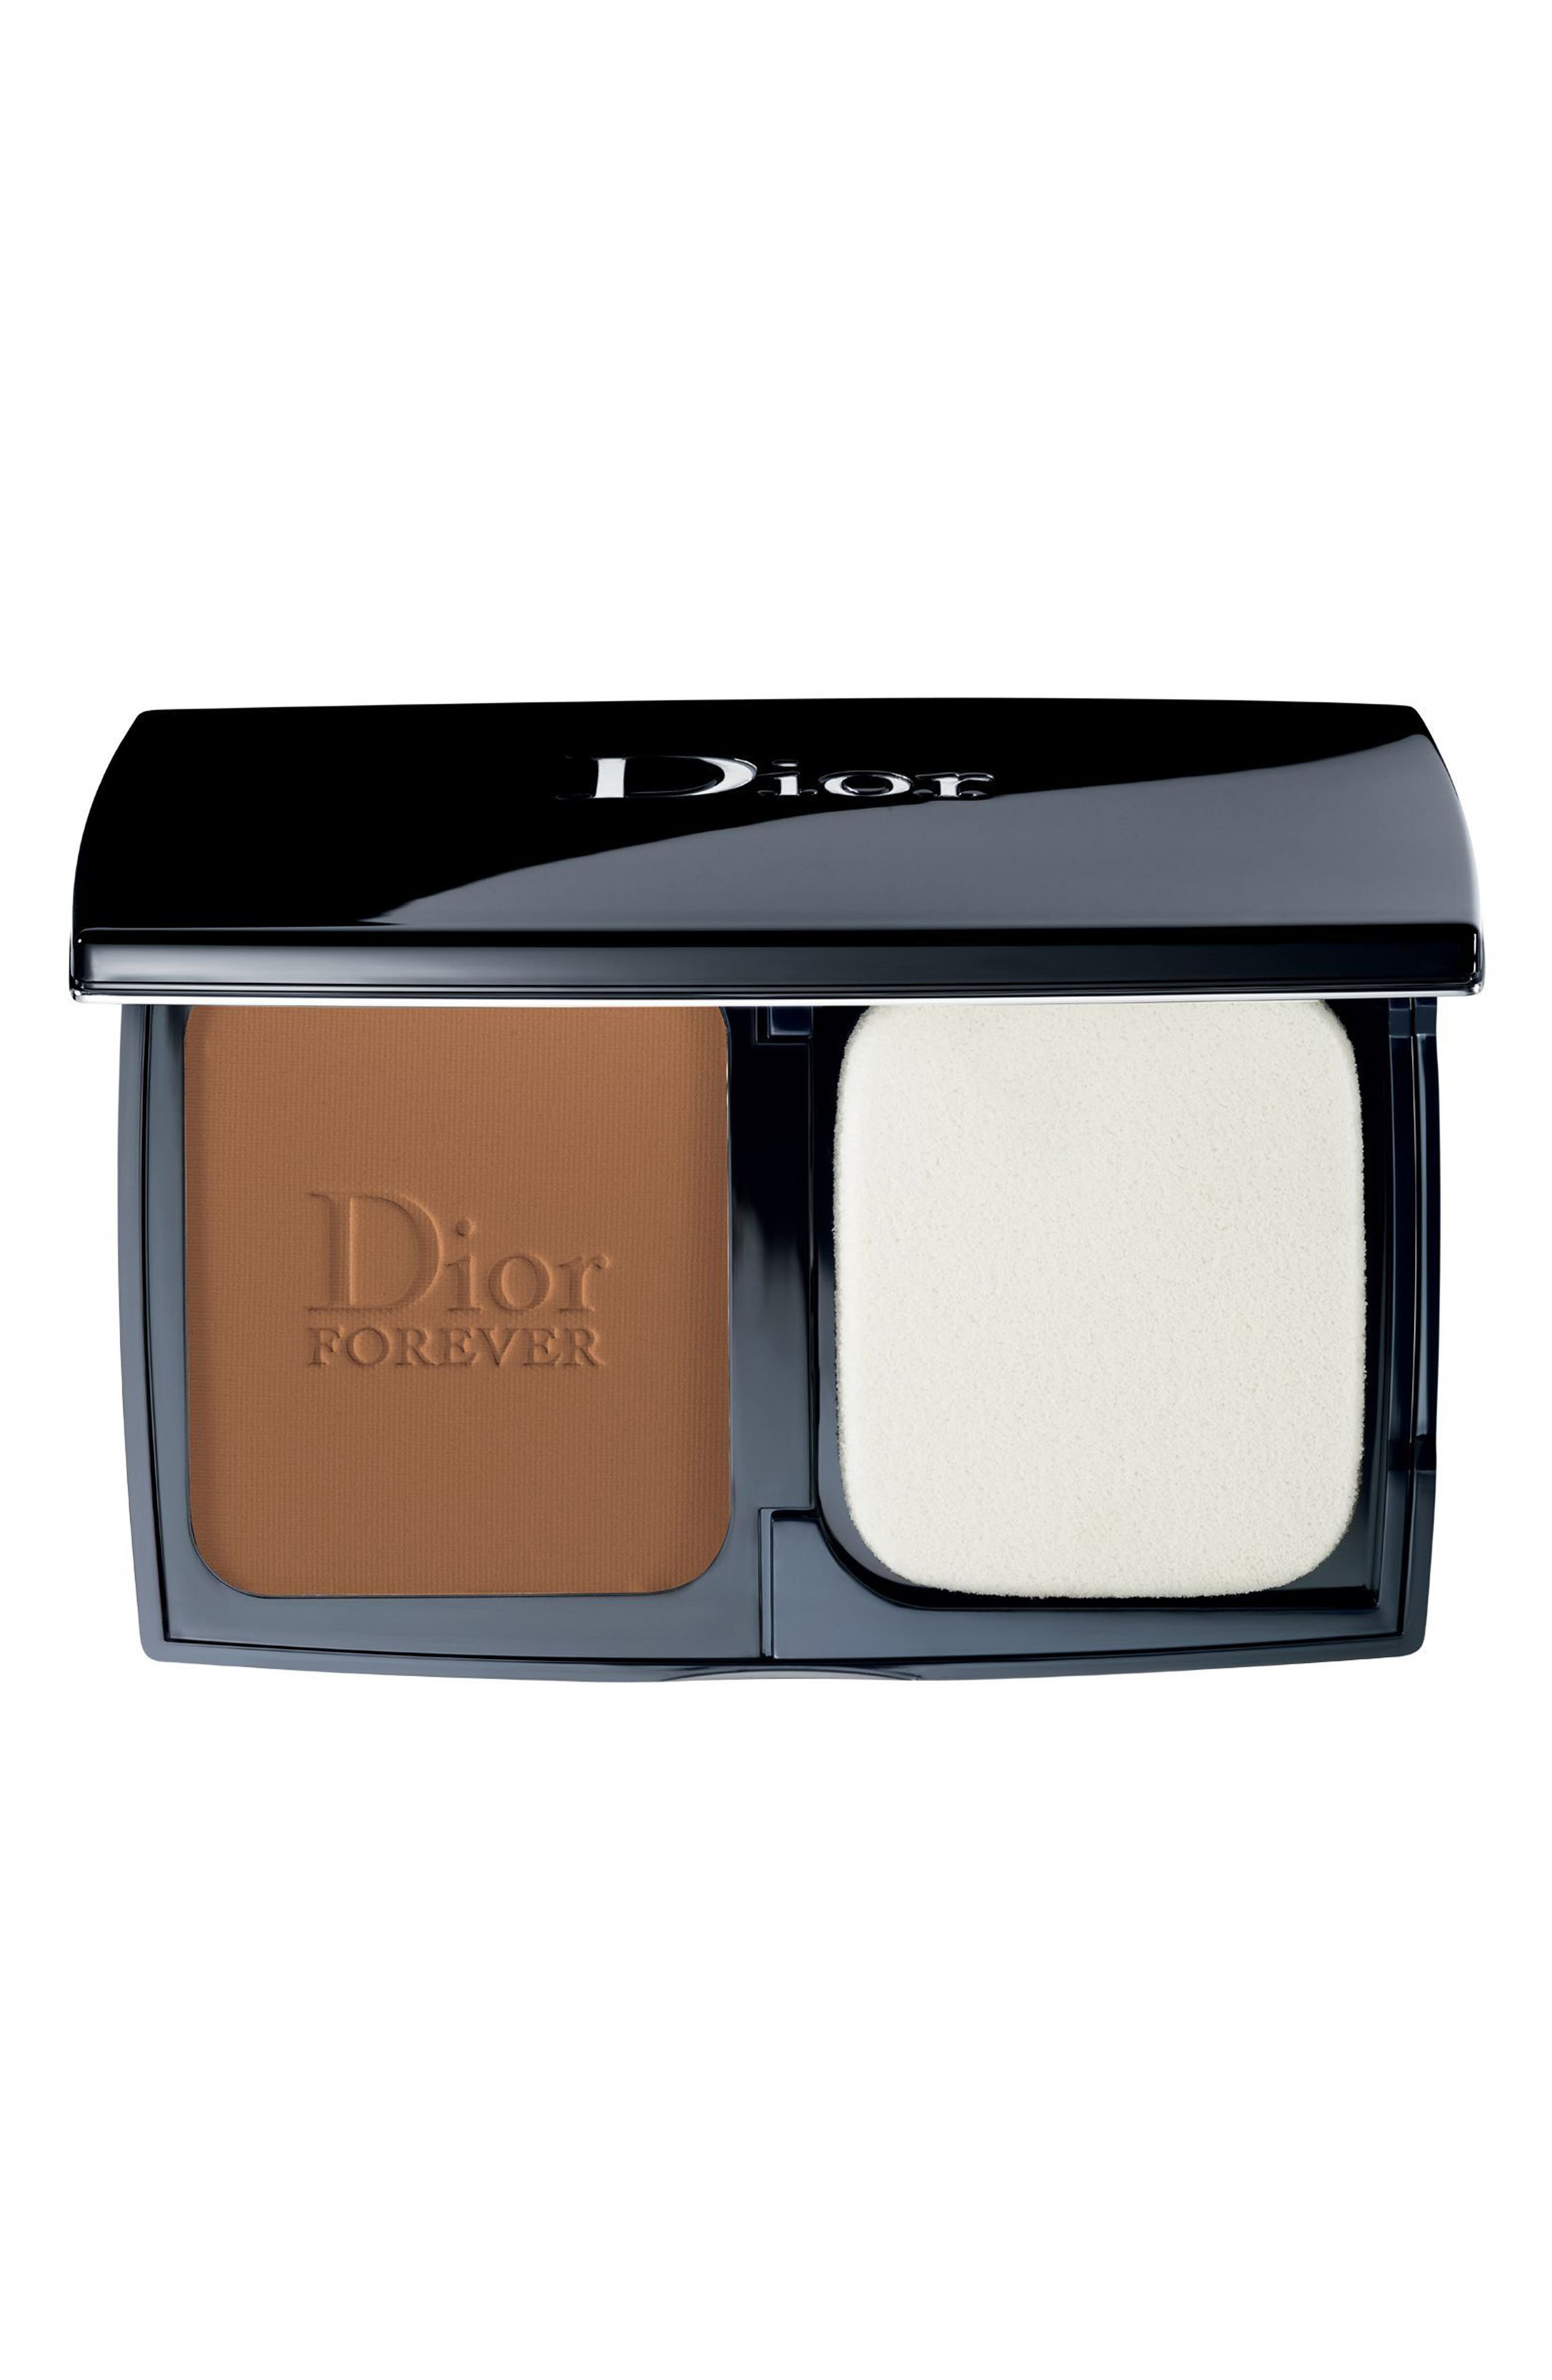 Dior Diorskin Forever Extreme Control - 070 Dark Brown